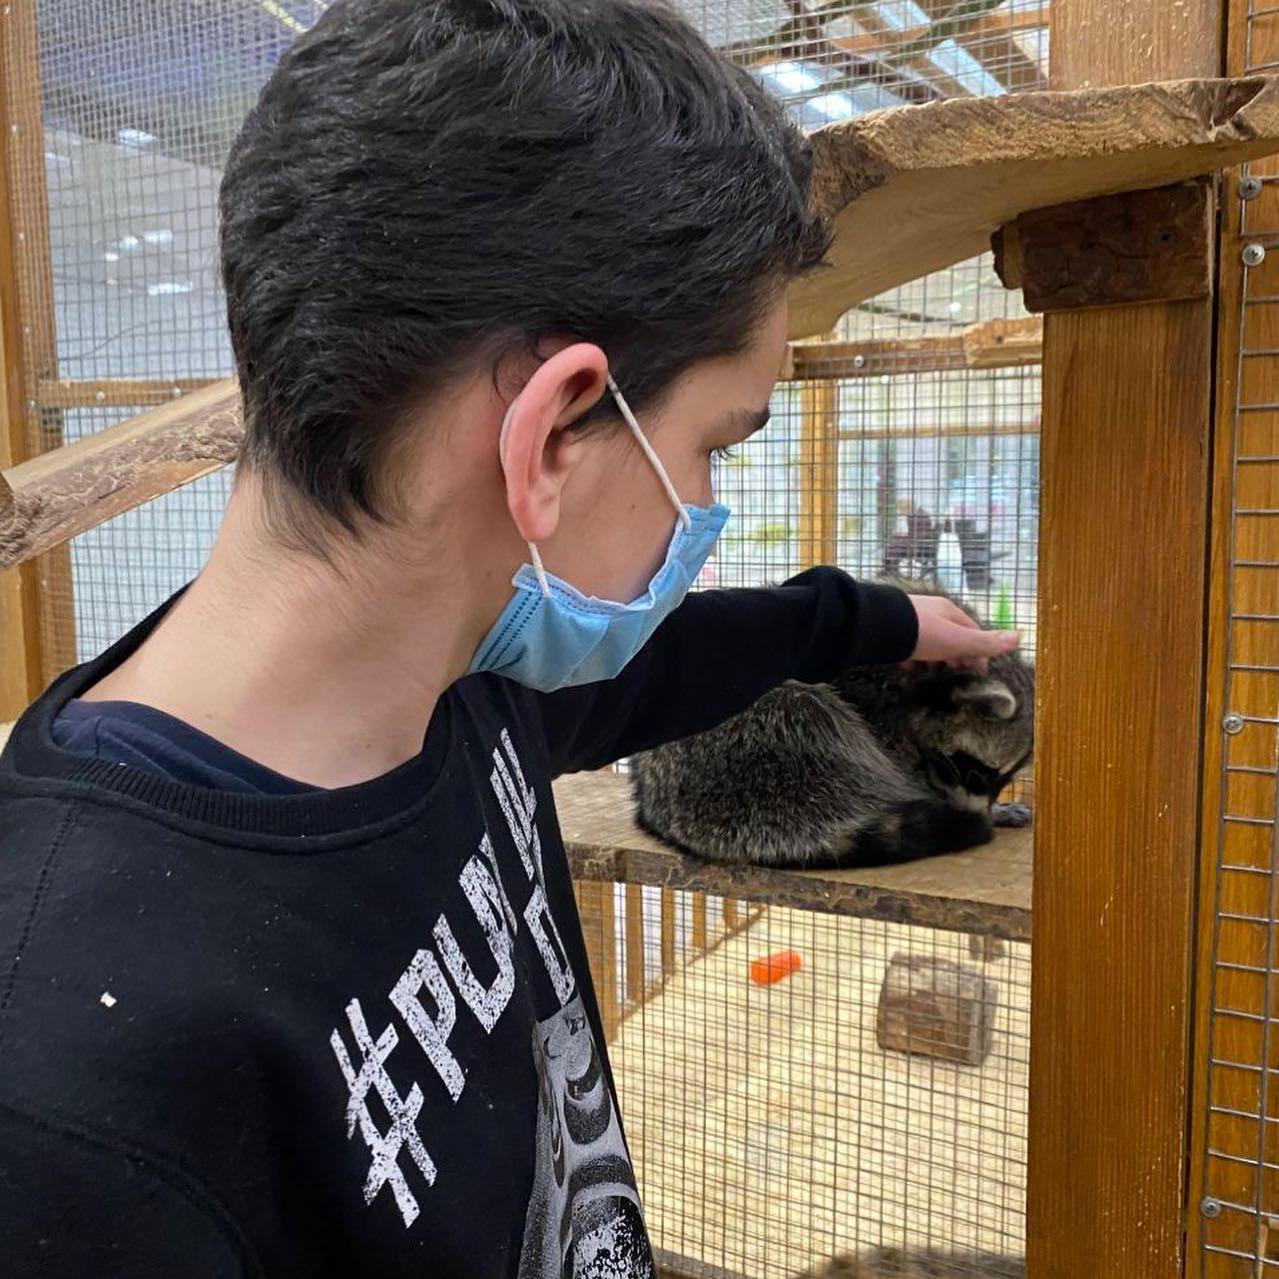 Contact zoo